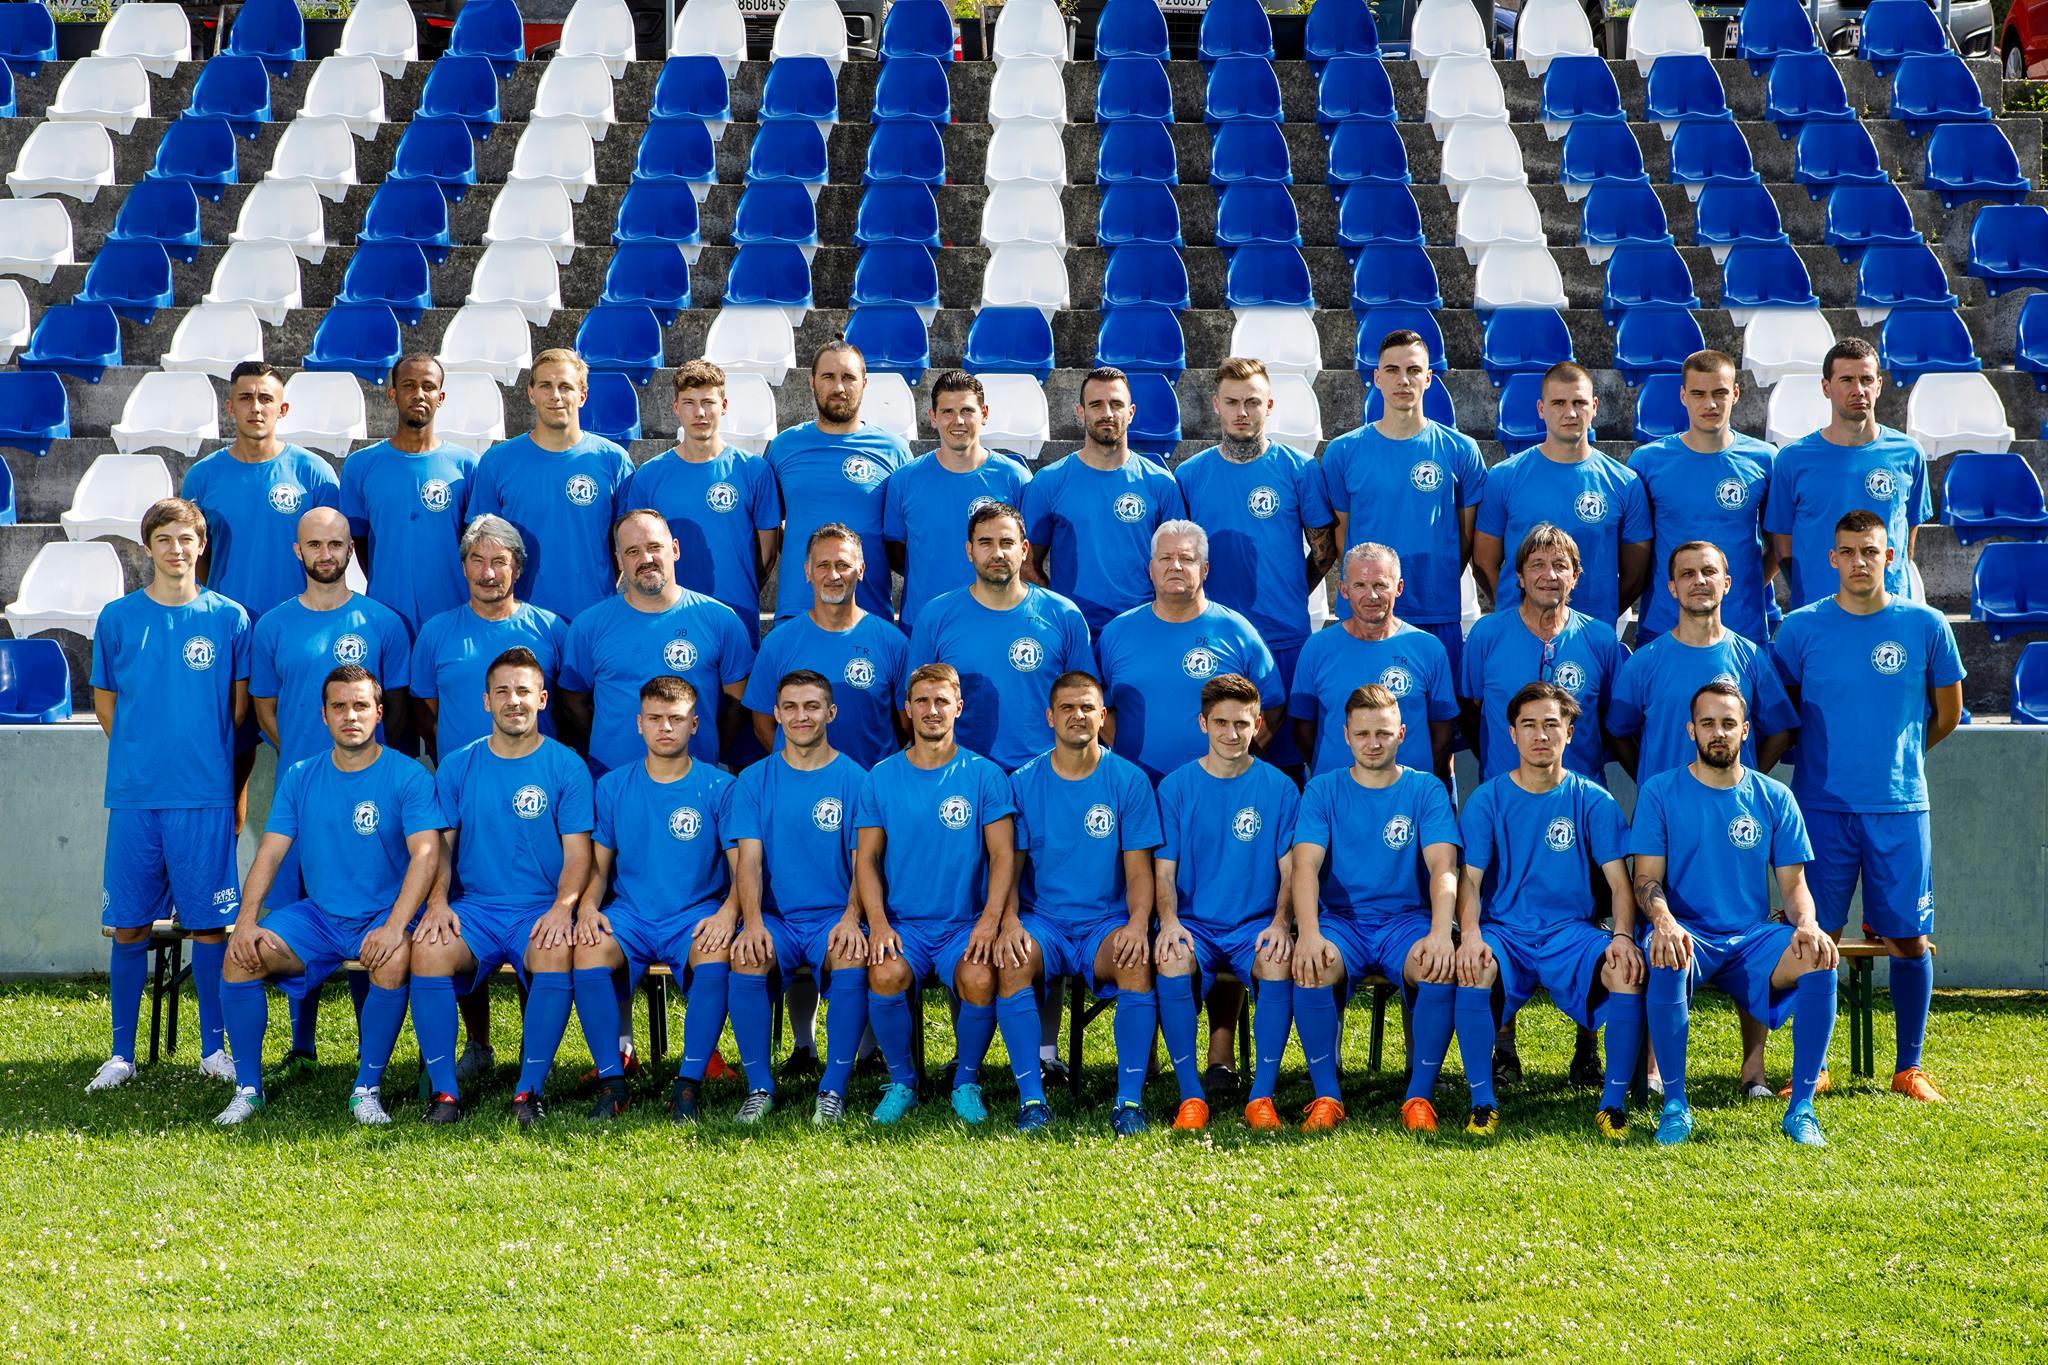 Kader SV Dinamo Helfort 1150 Wien Kampfmannschaft Fußball Österreich